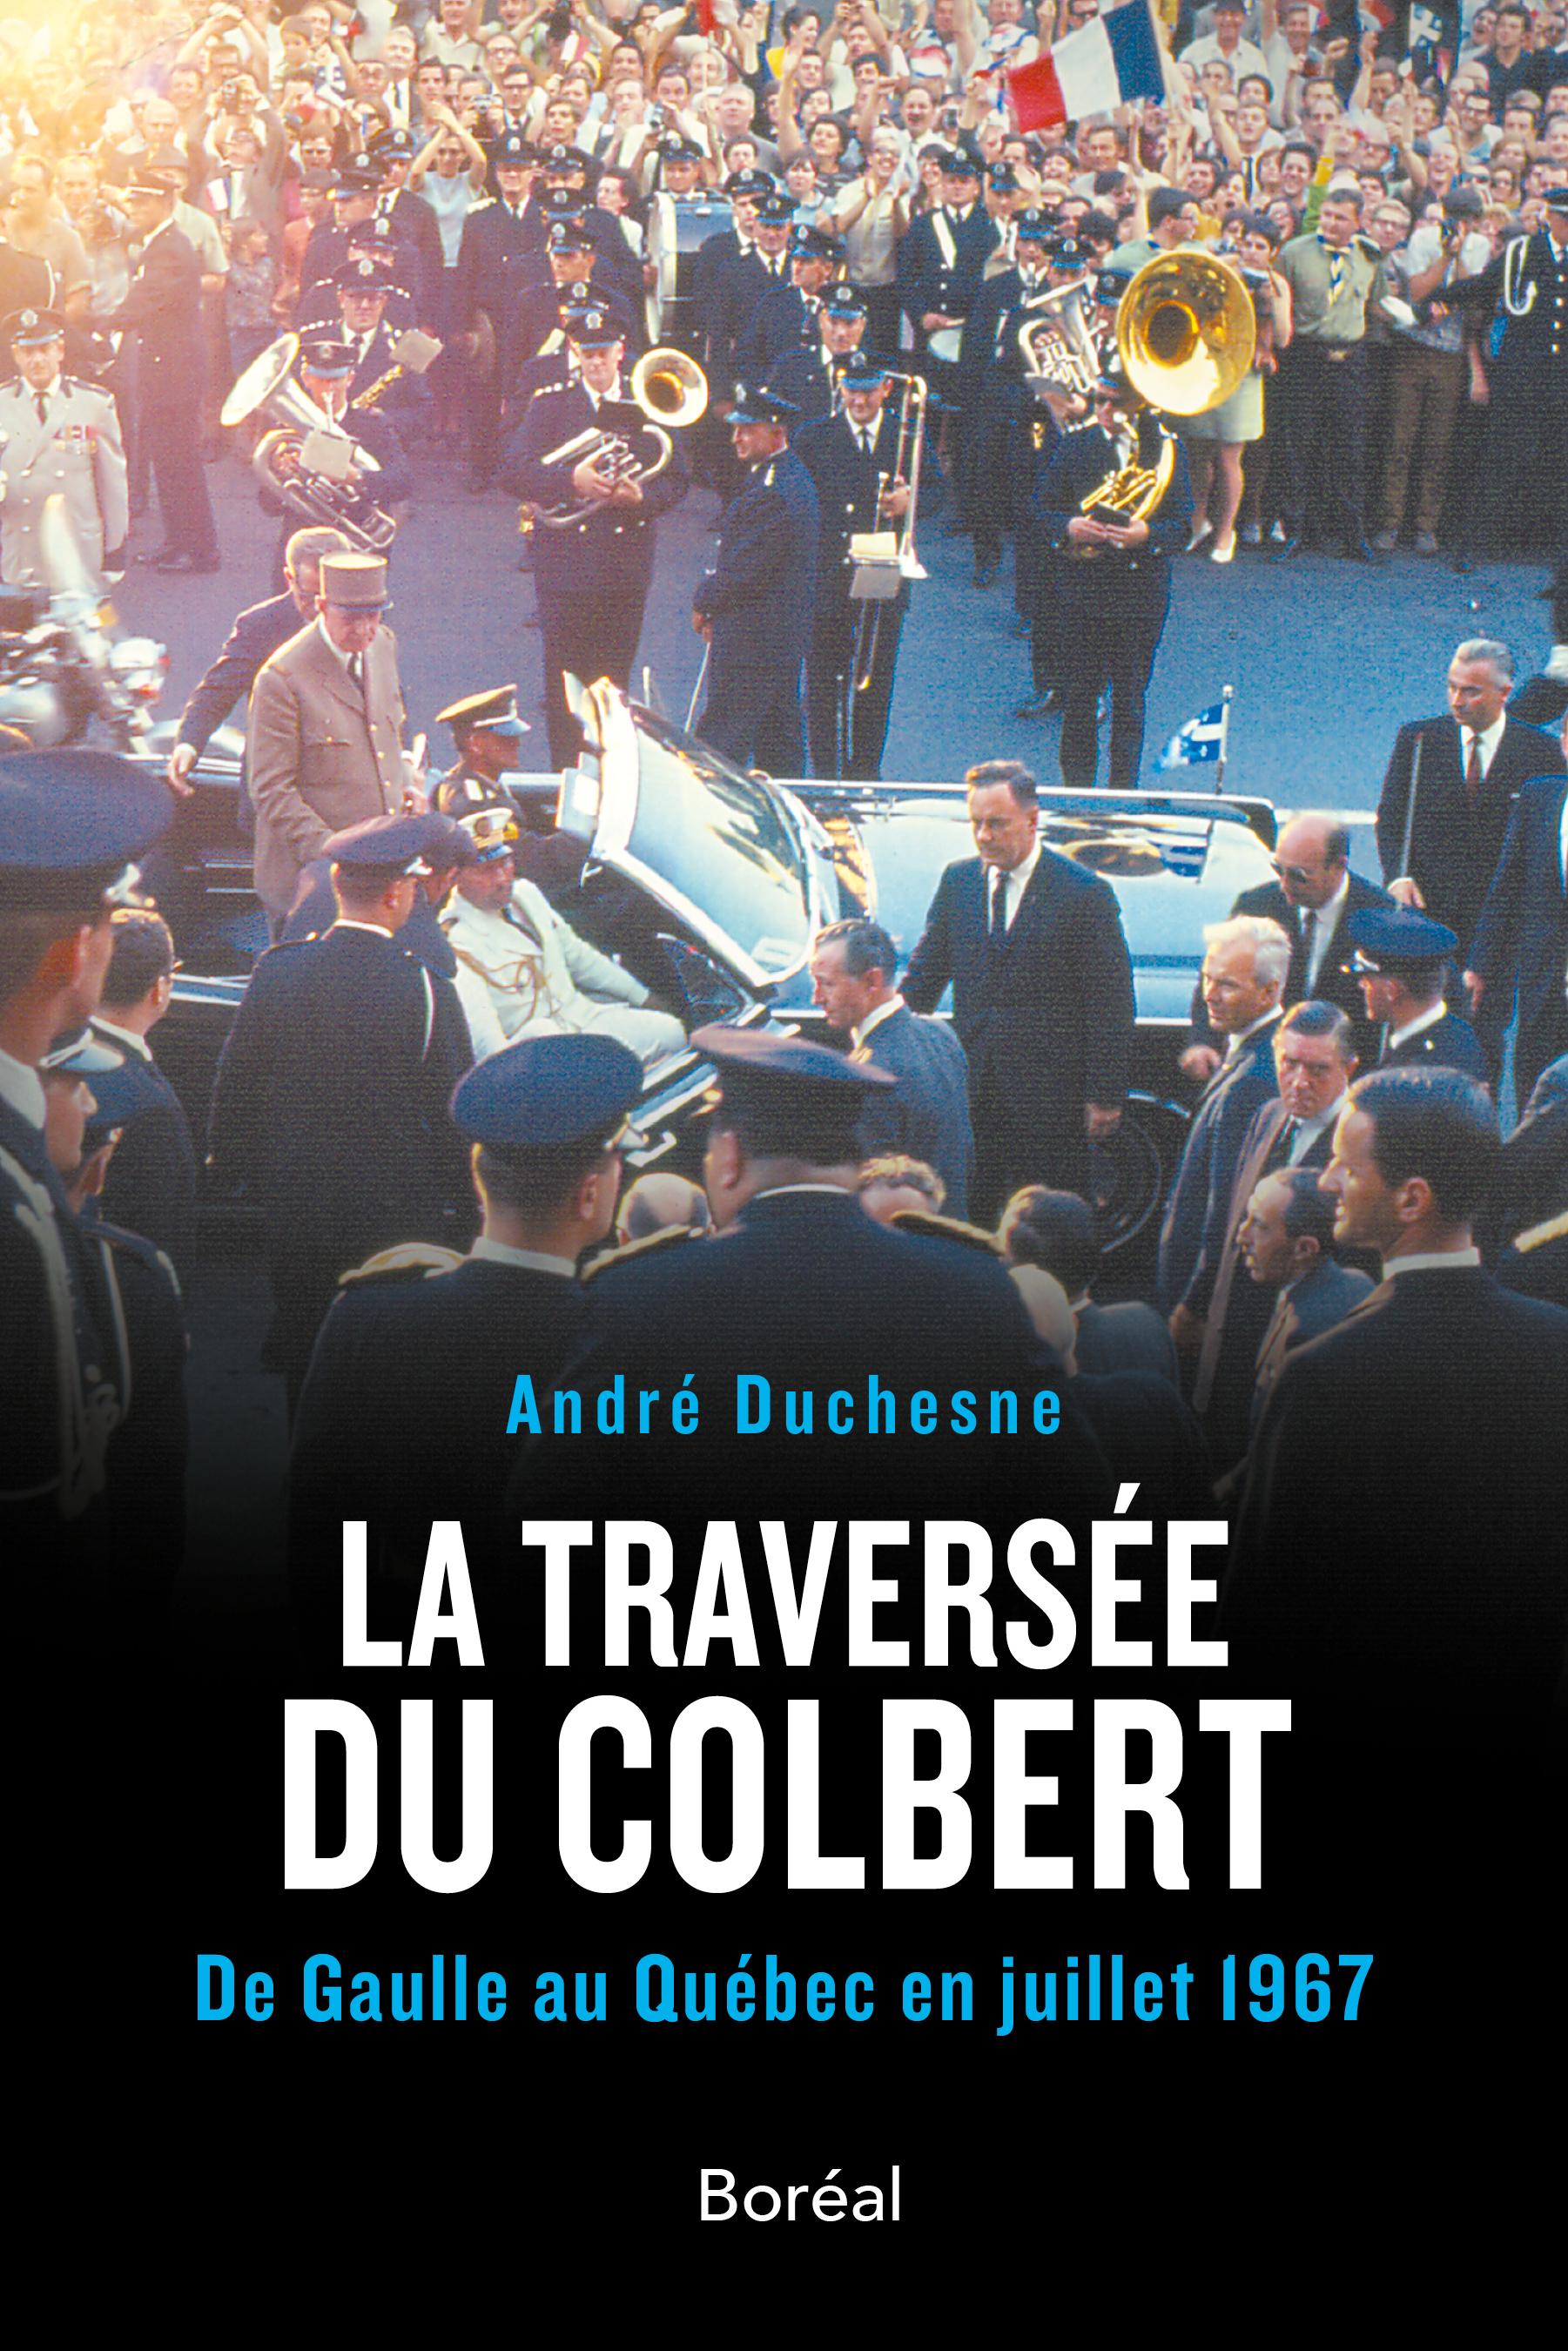 La Traversée du Colbert